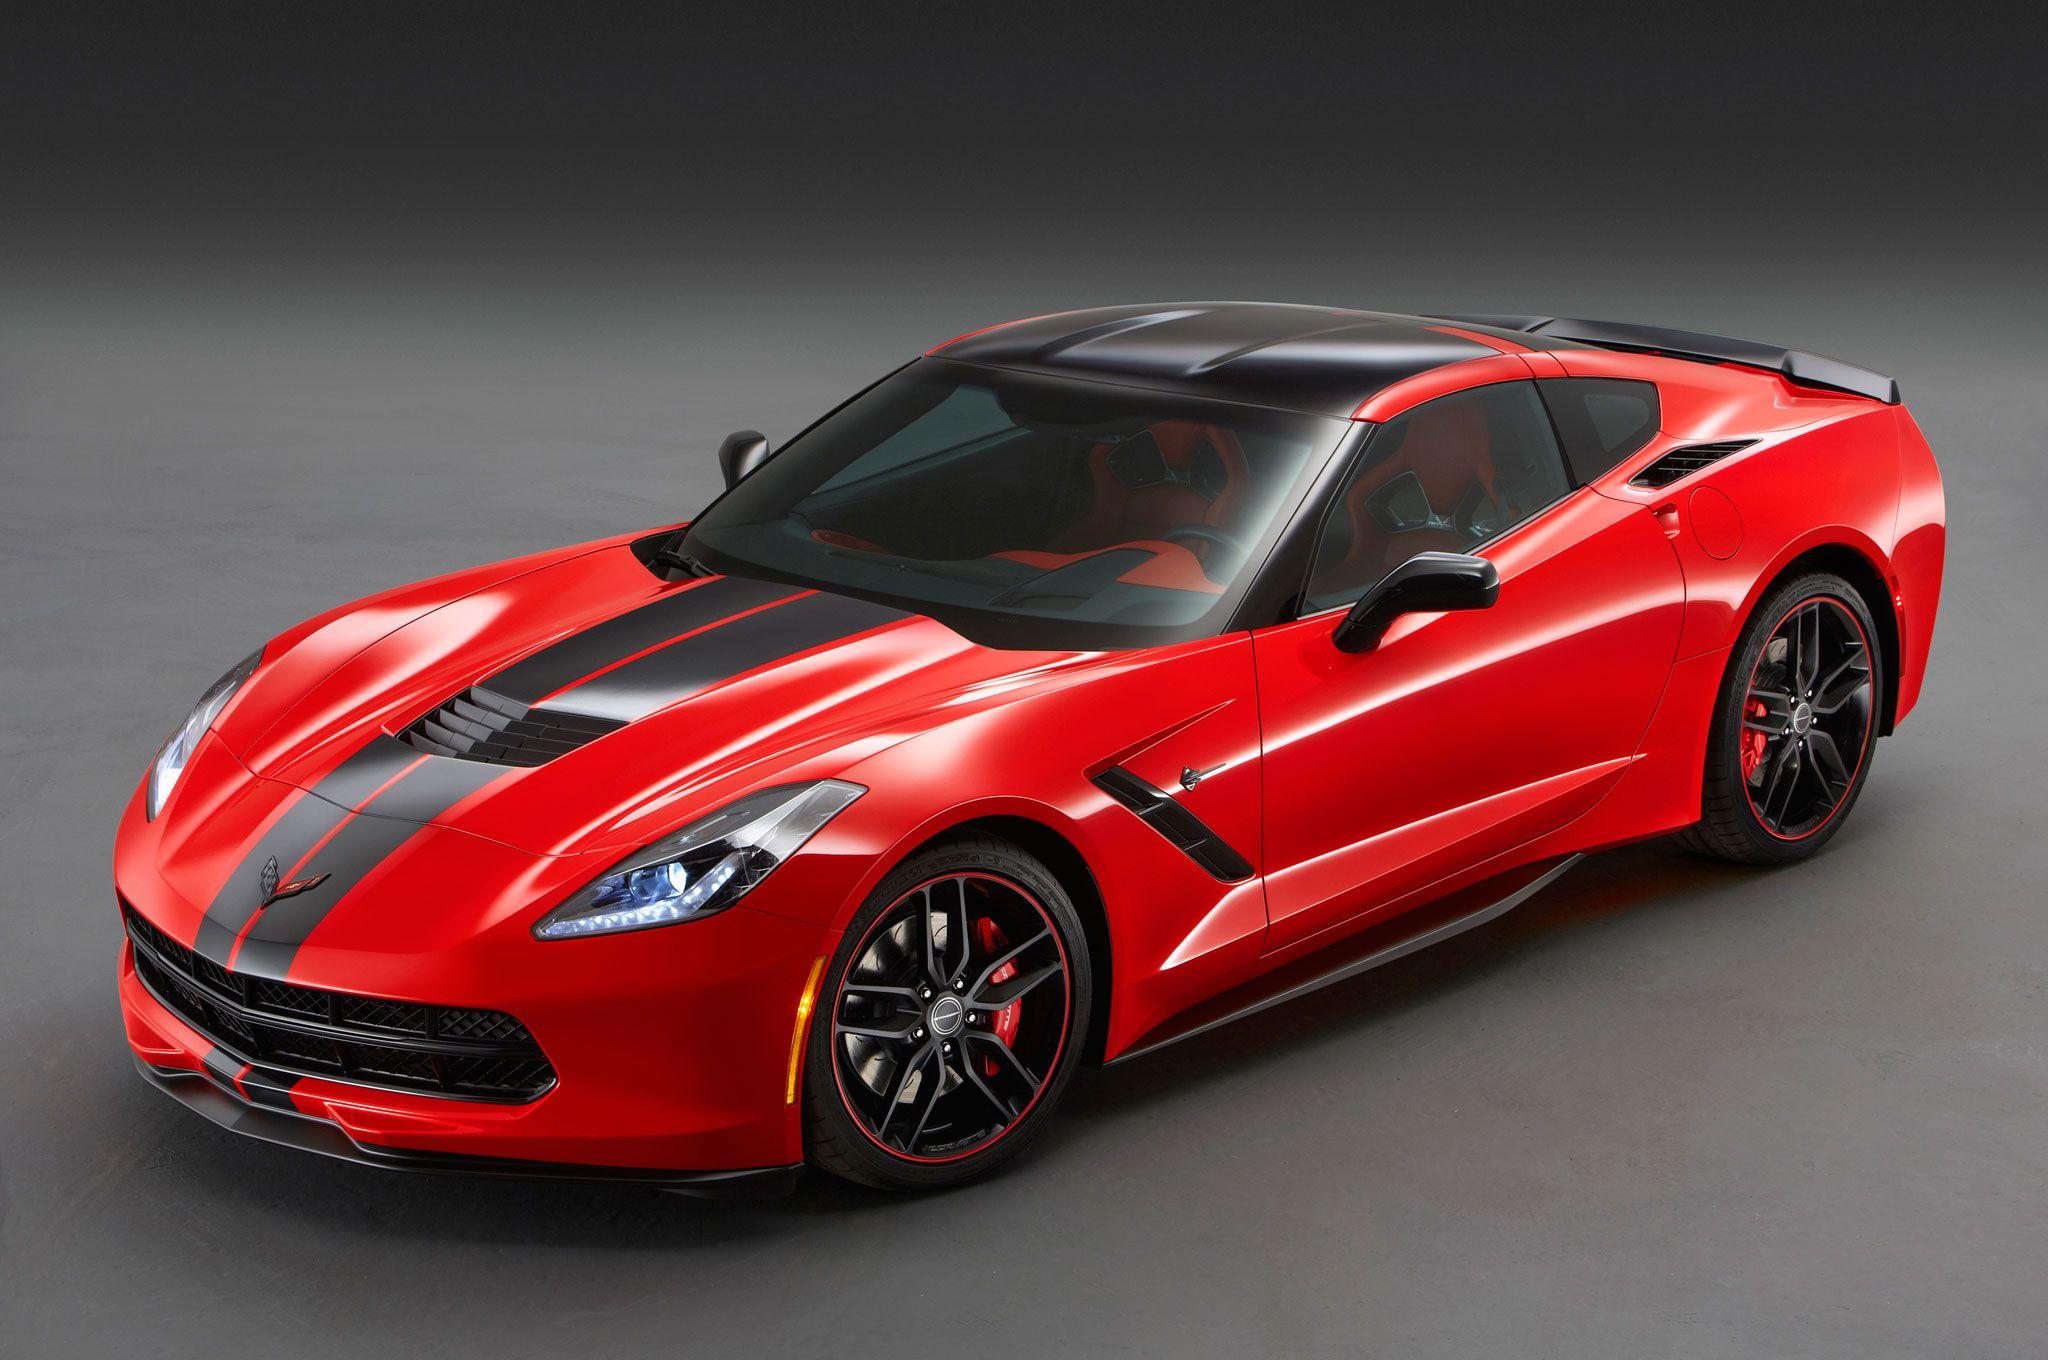 2015 Corvette Stingray C7 Coupe Z06 Supercharged LT4 engine 6 2Lt V